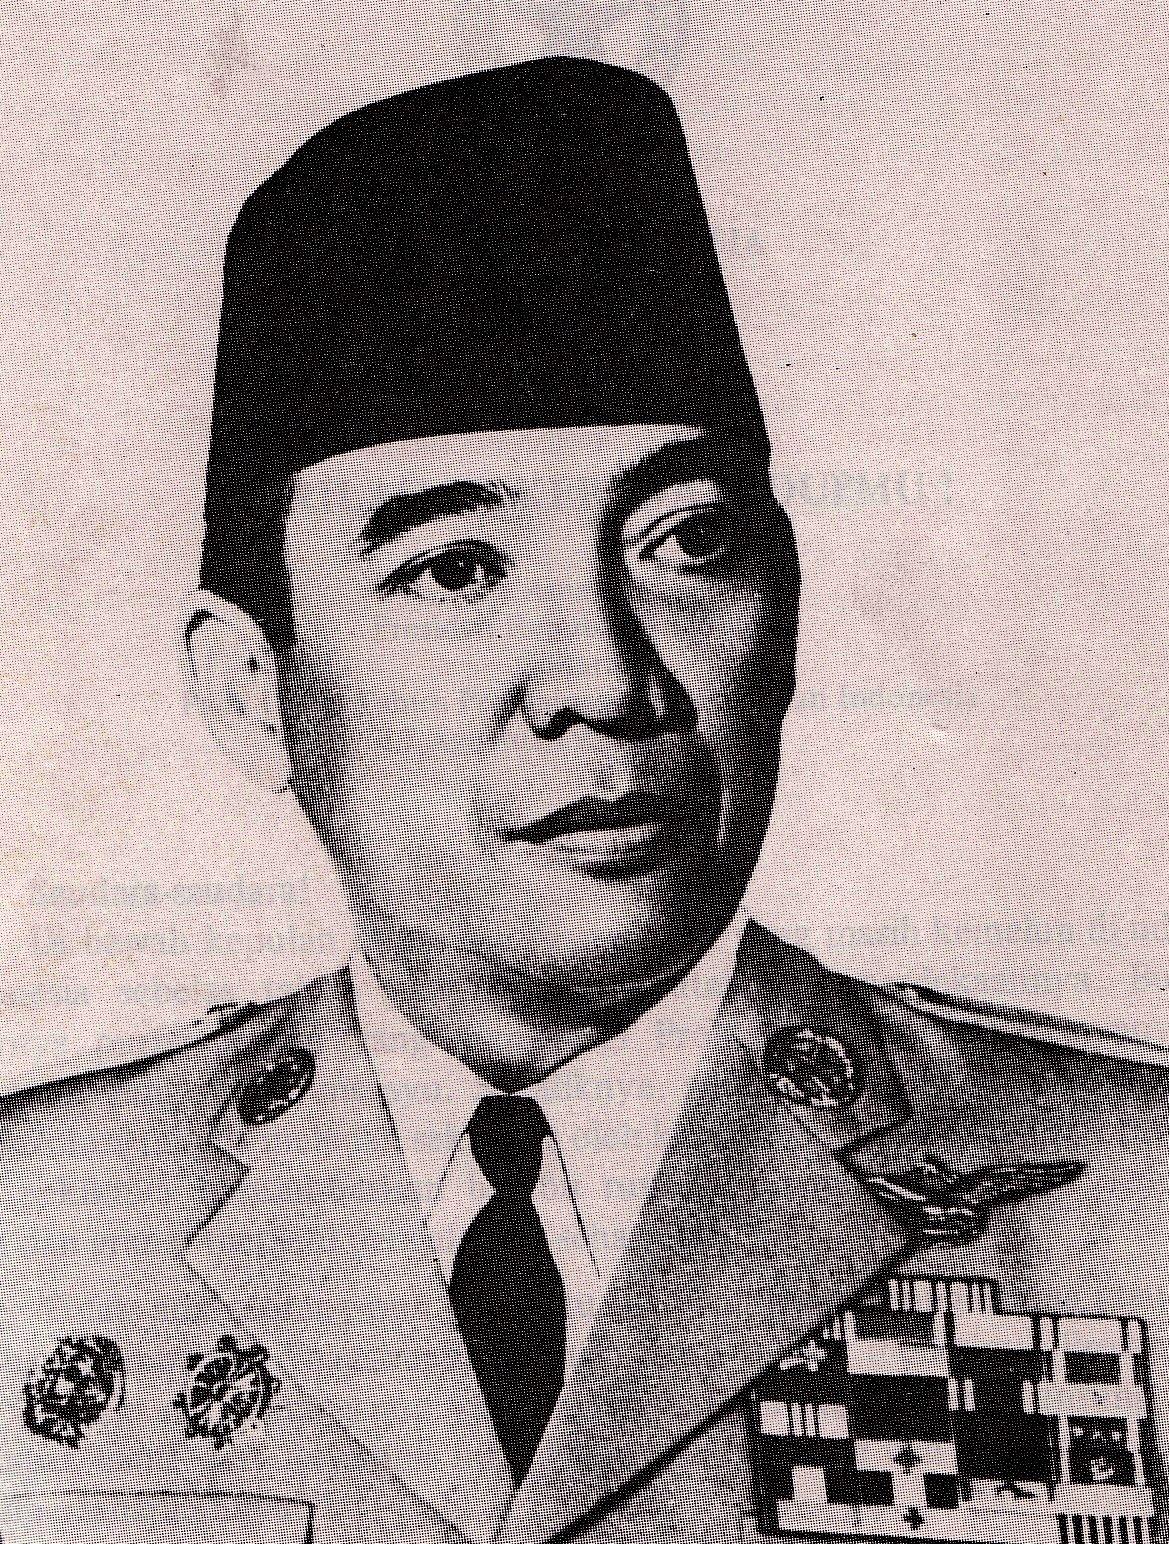 Nasional Indonesia: Gambar Mantan Presiden Sukarno atau Bung Karno